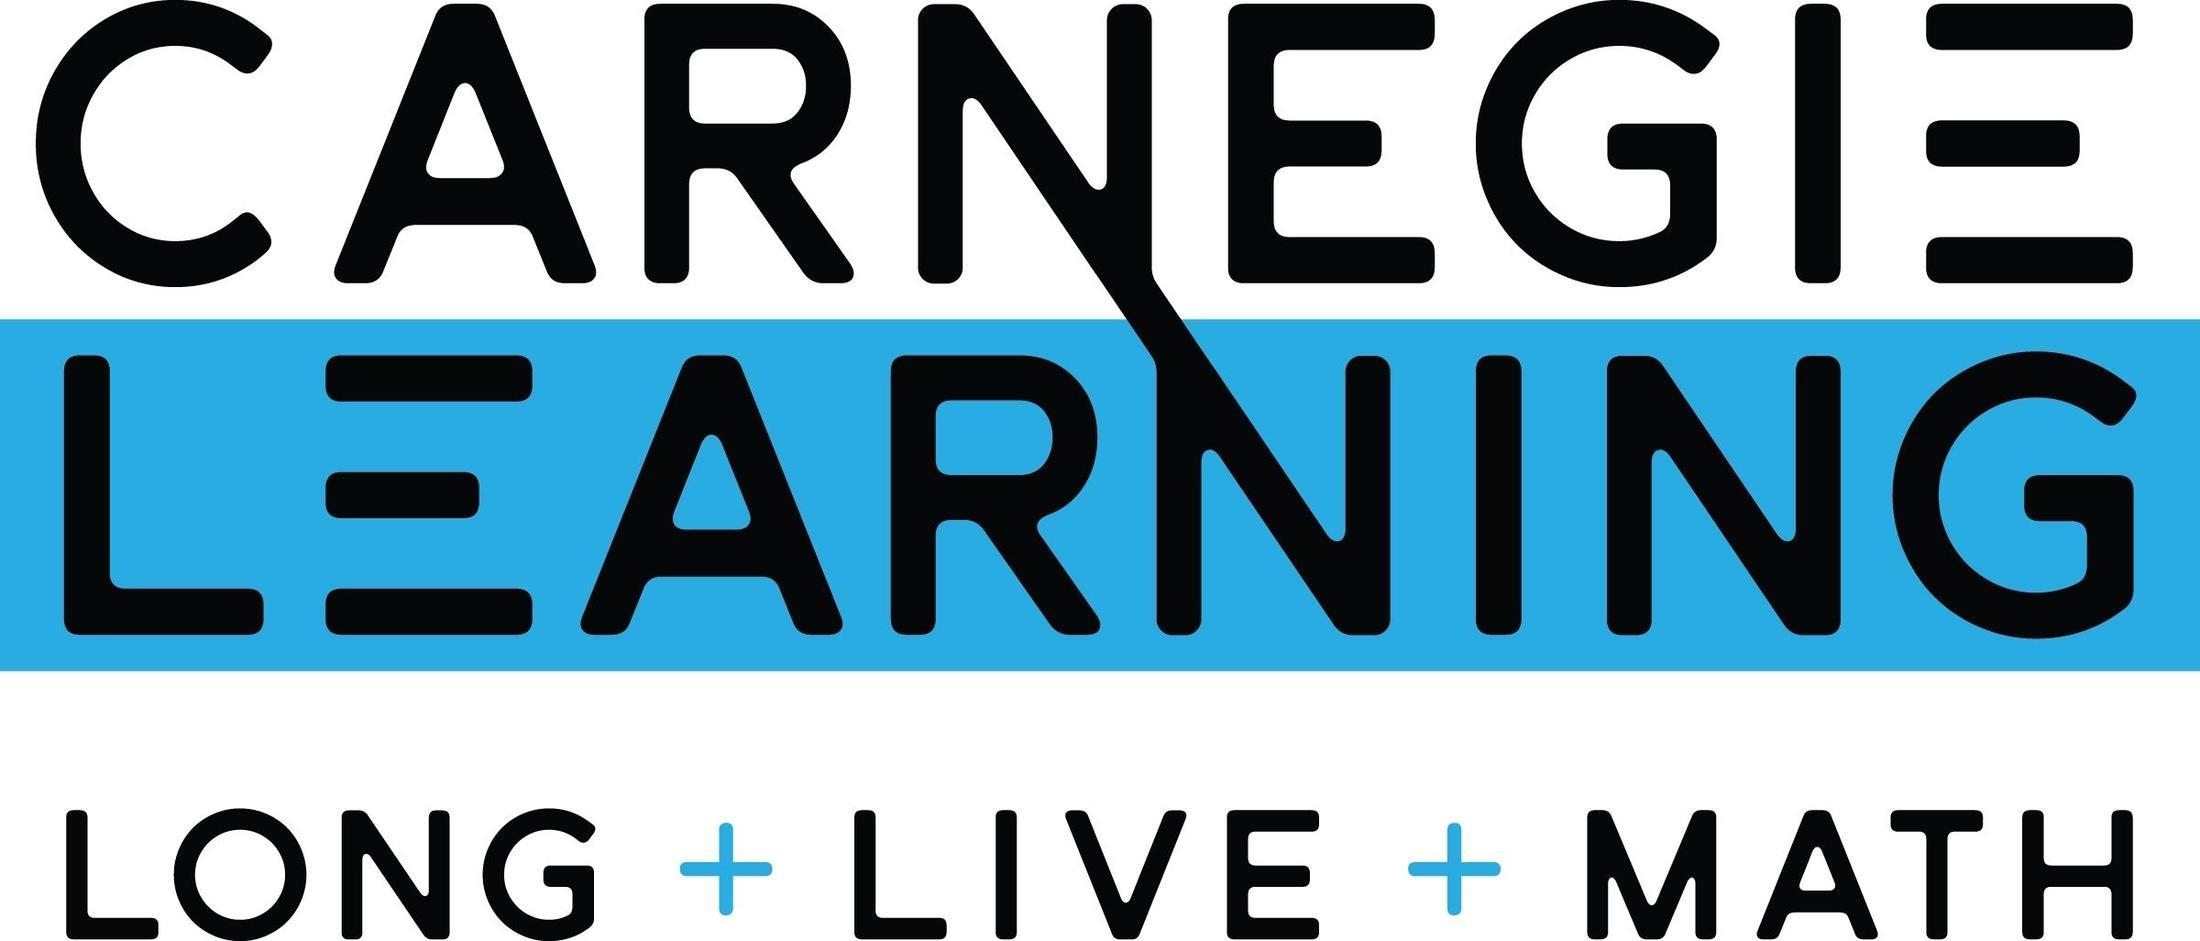 Curriculum/Textbook – Curriculum/Textbook – ABC Unified School District